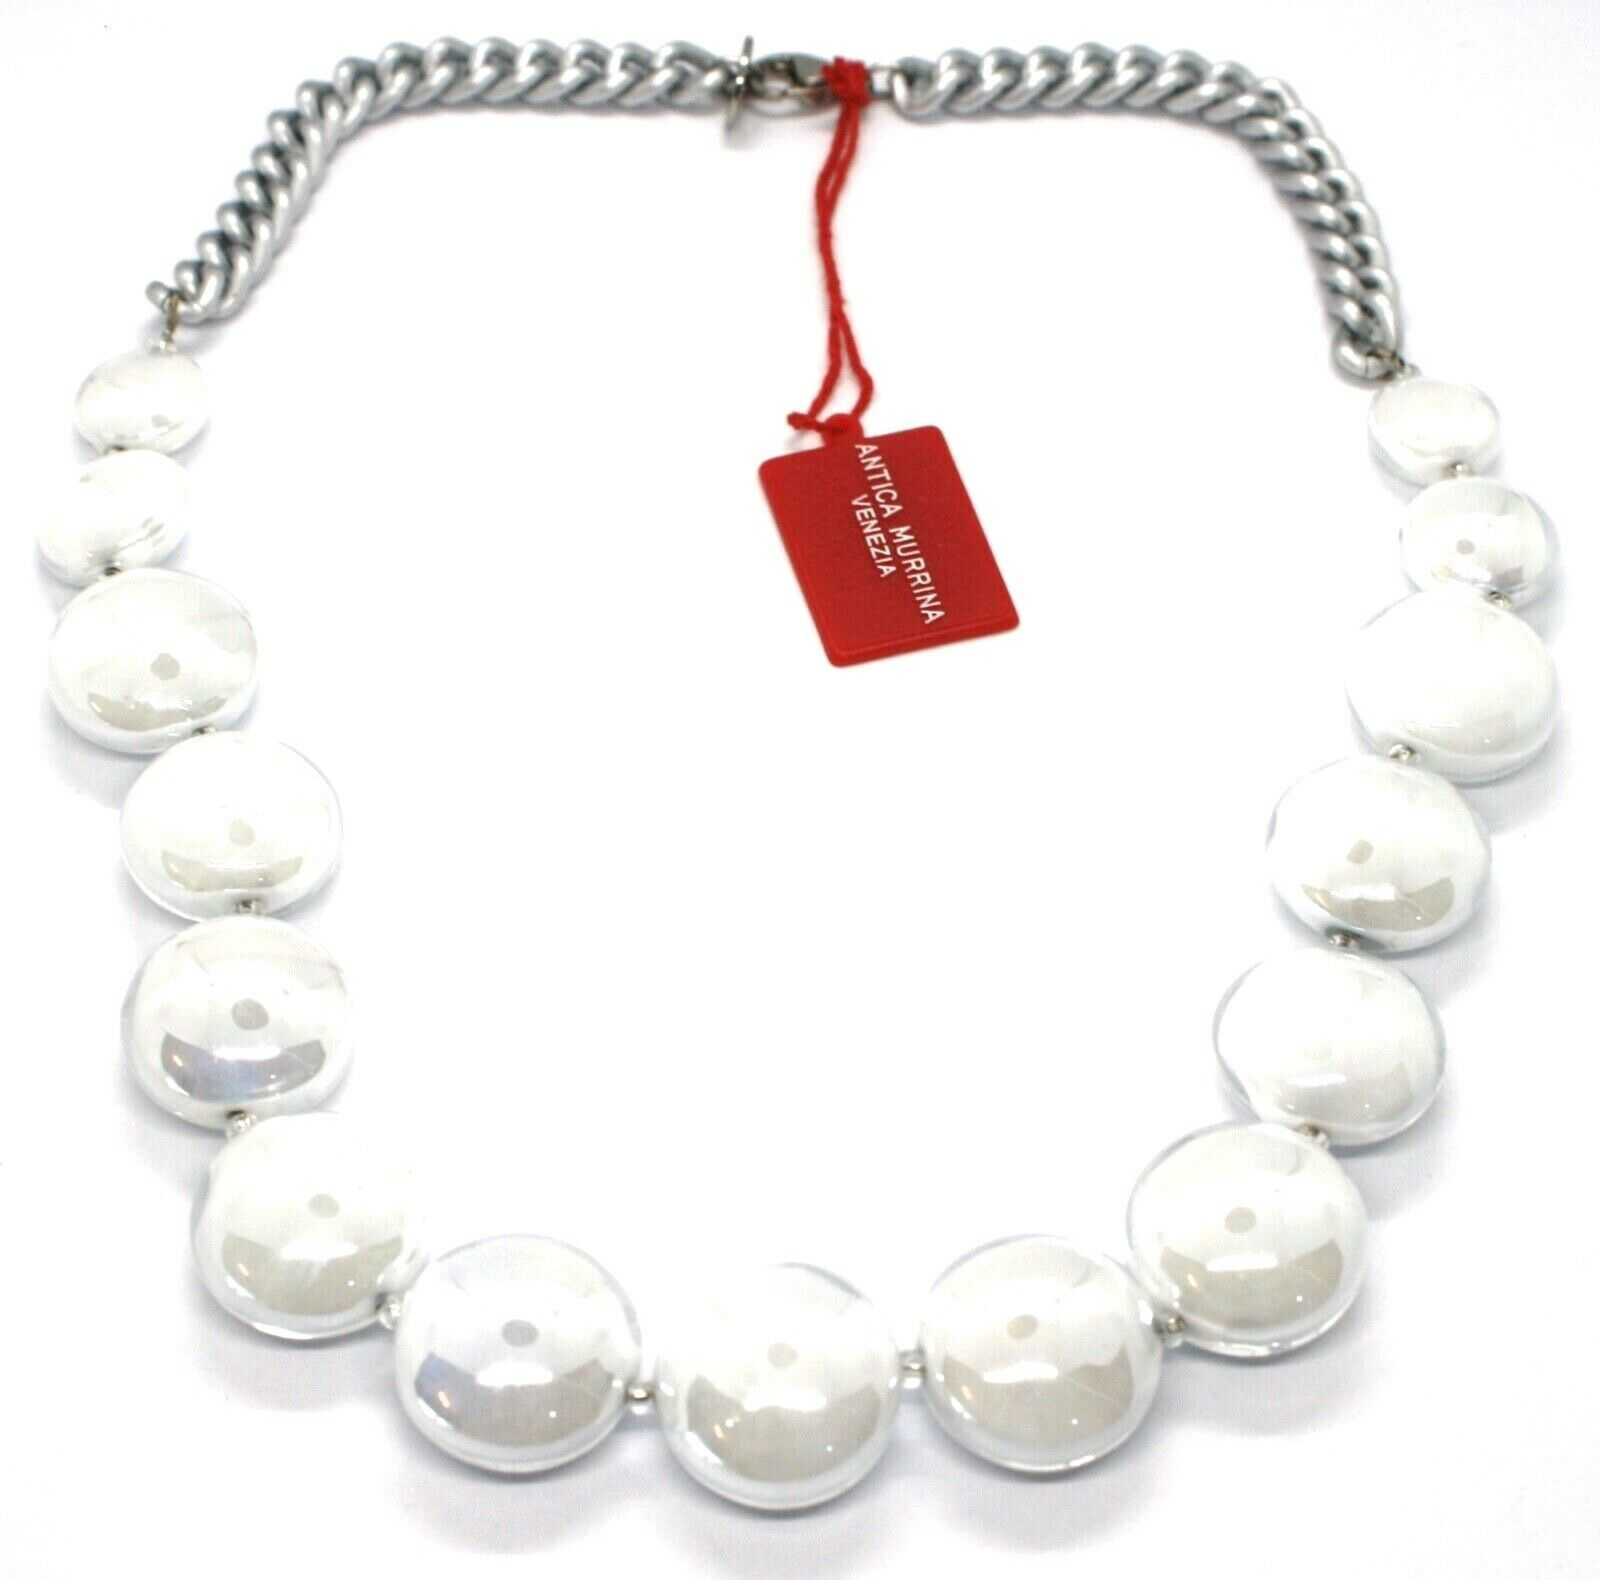 Necklace Antique Murrina, CO833A02, Chain Groumette, Discs, White Pearl